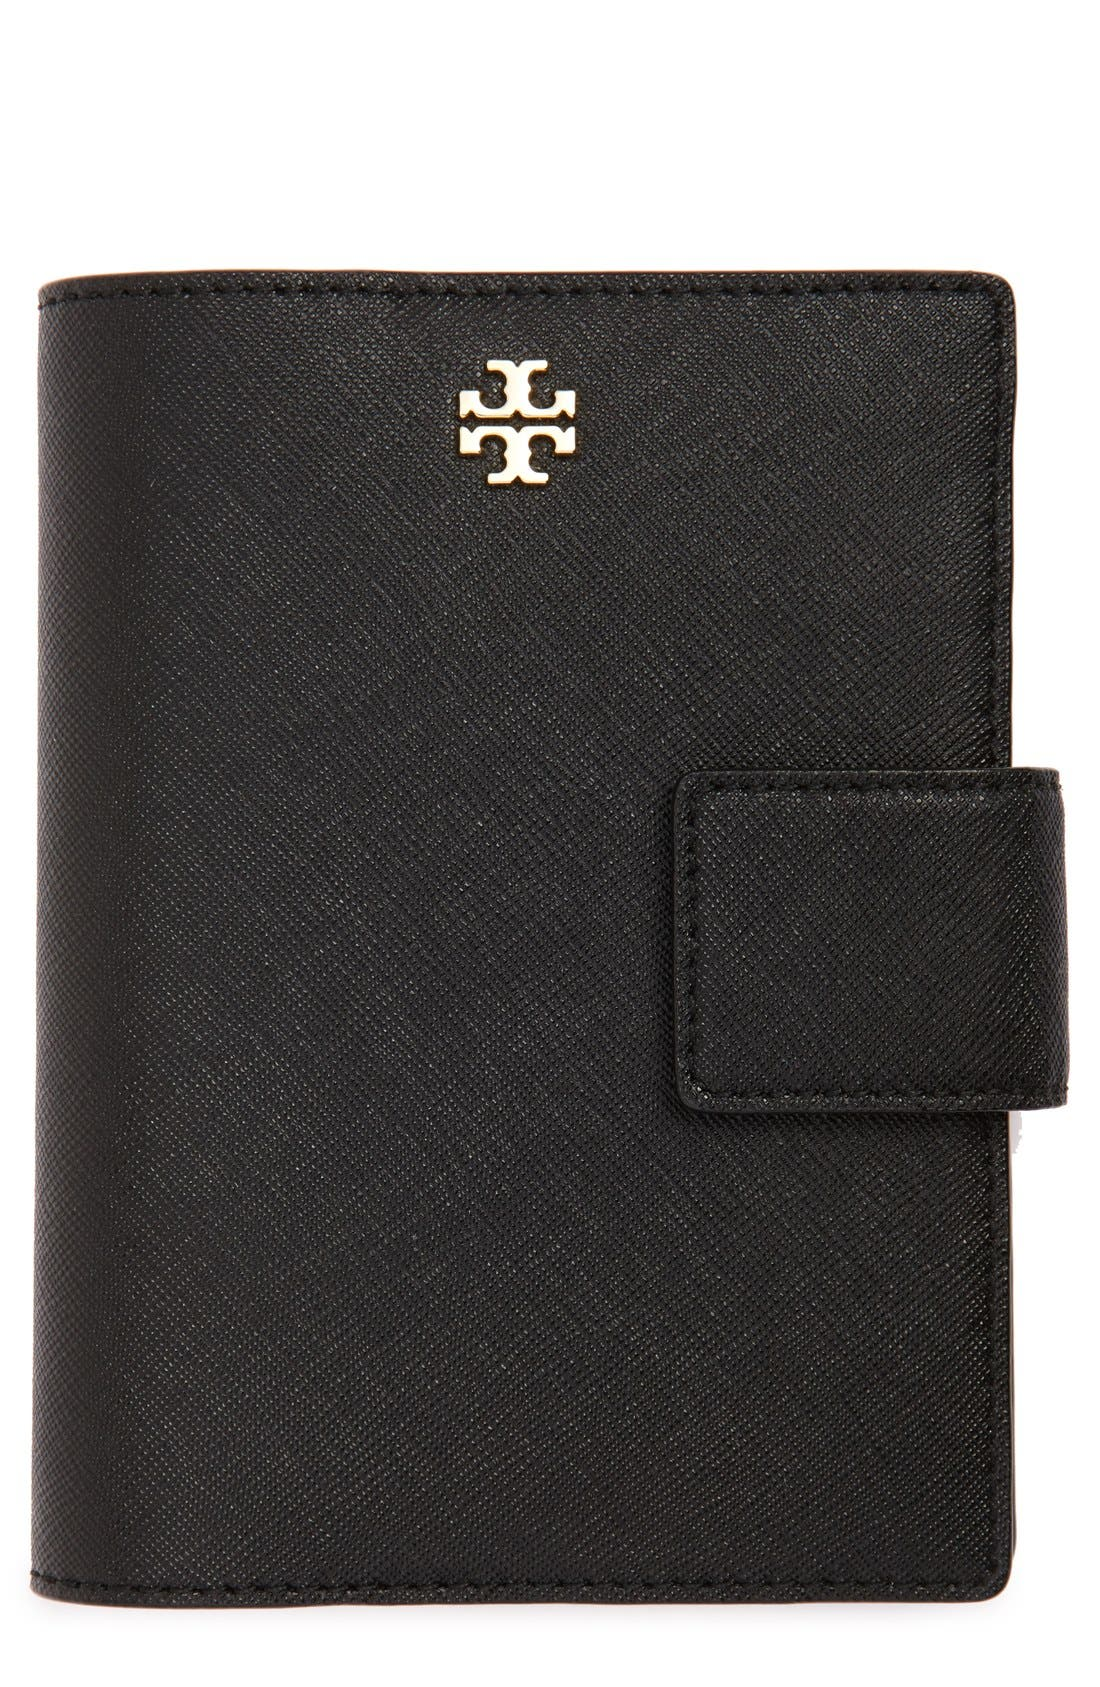 'Robinson' Passport Holder, Main, color, 001